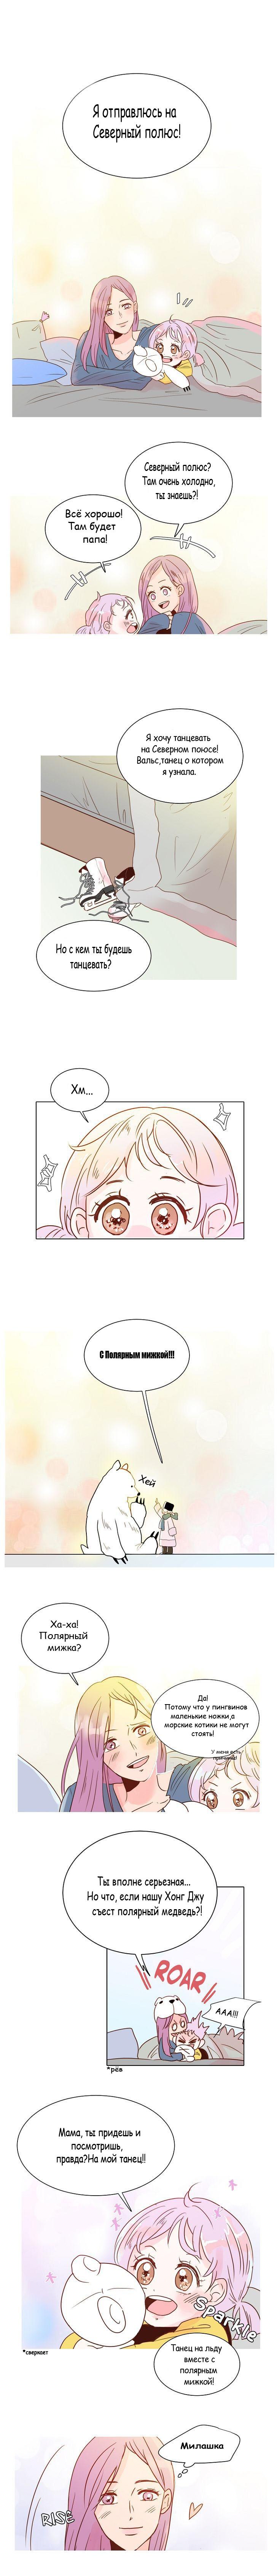 https://r2.ninemanga.com/comics/pic3/32/36128/1299584/154722842398.jpg Page 1